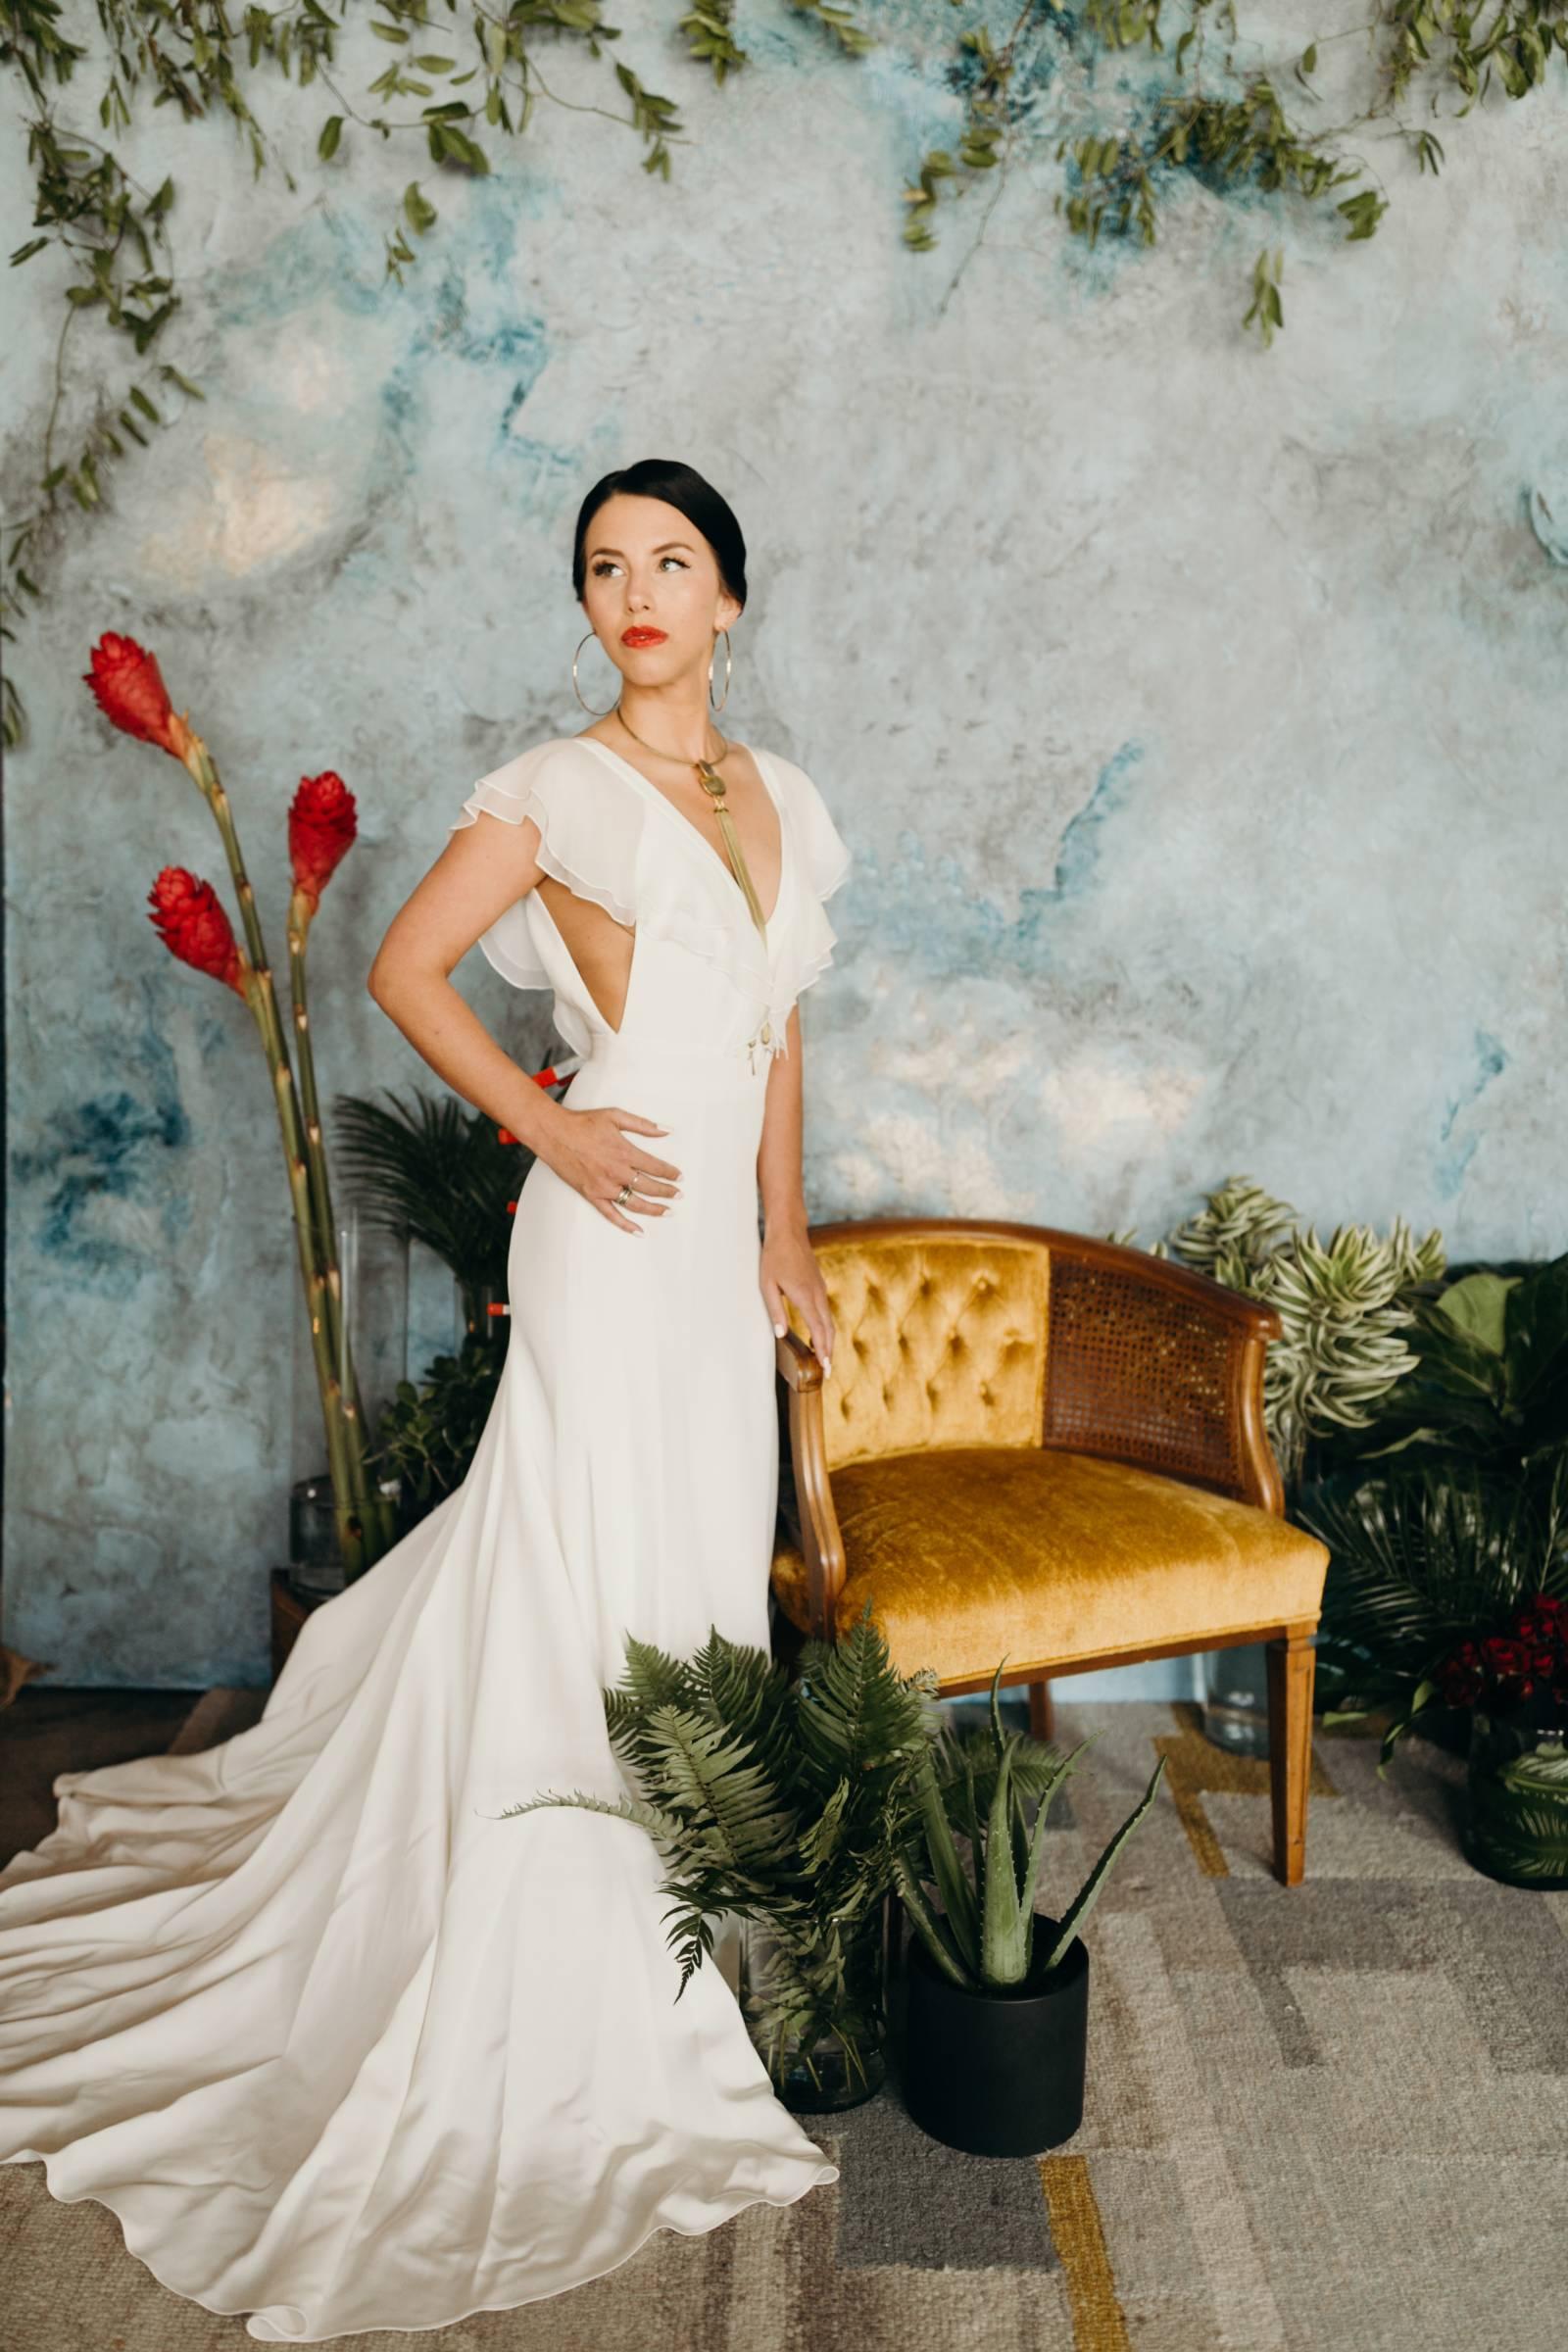 Cuban Inspired Wedding Dress Collection by Gretchen Dawley ...